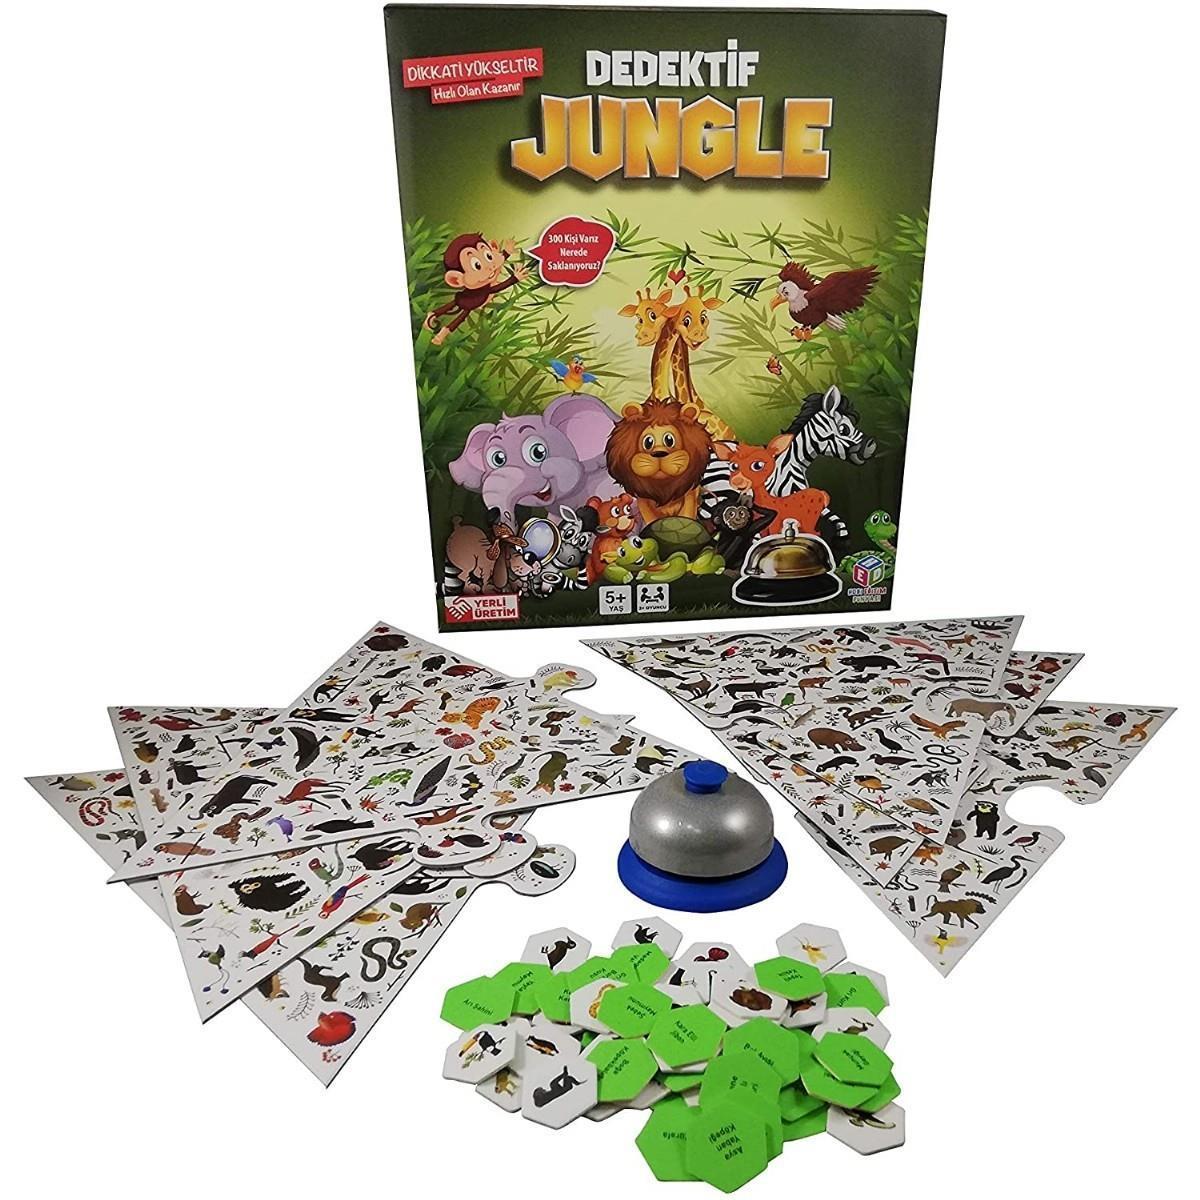 <span>Dedektif Jungle Seç - Göster Oyunu</span>